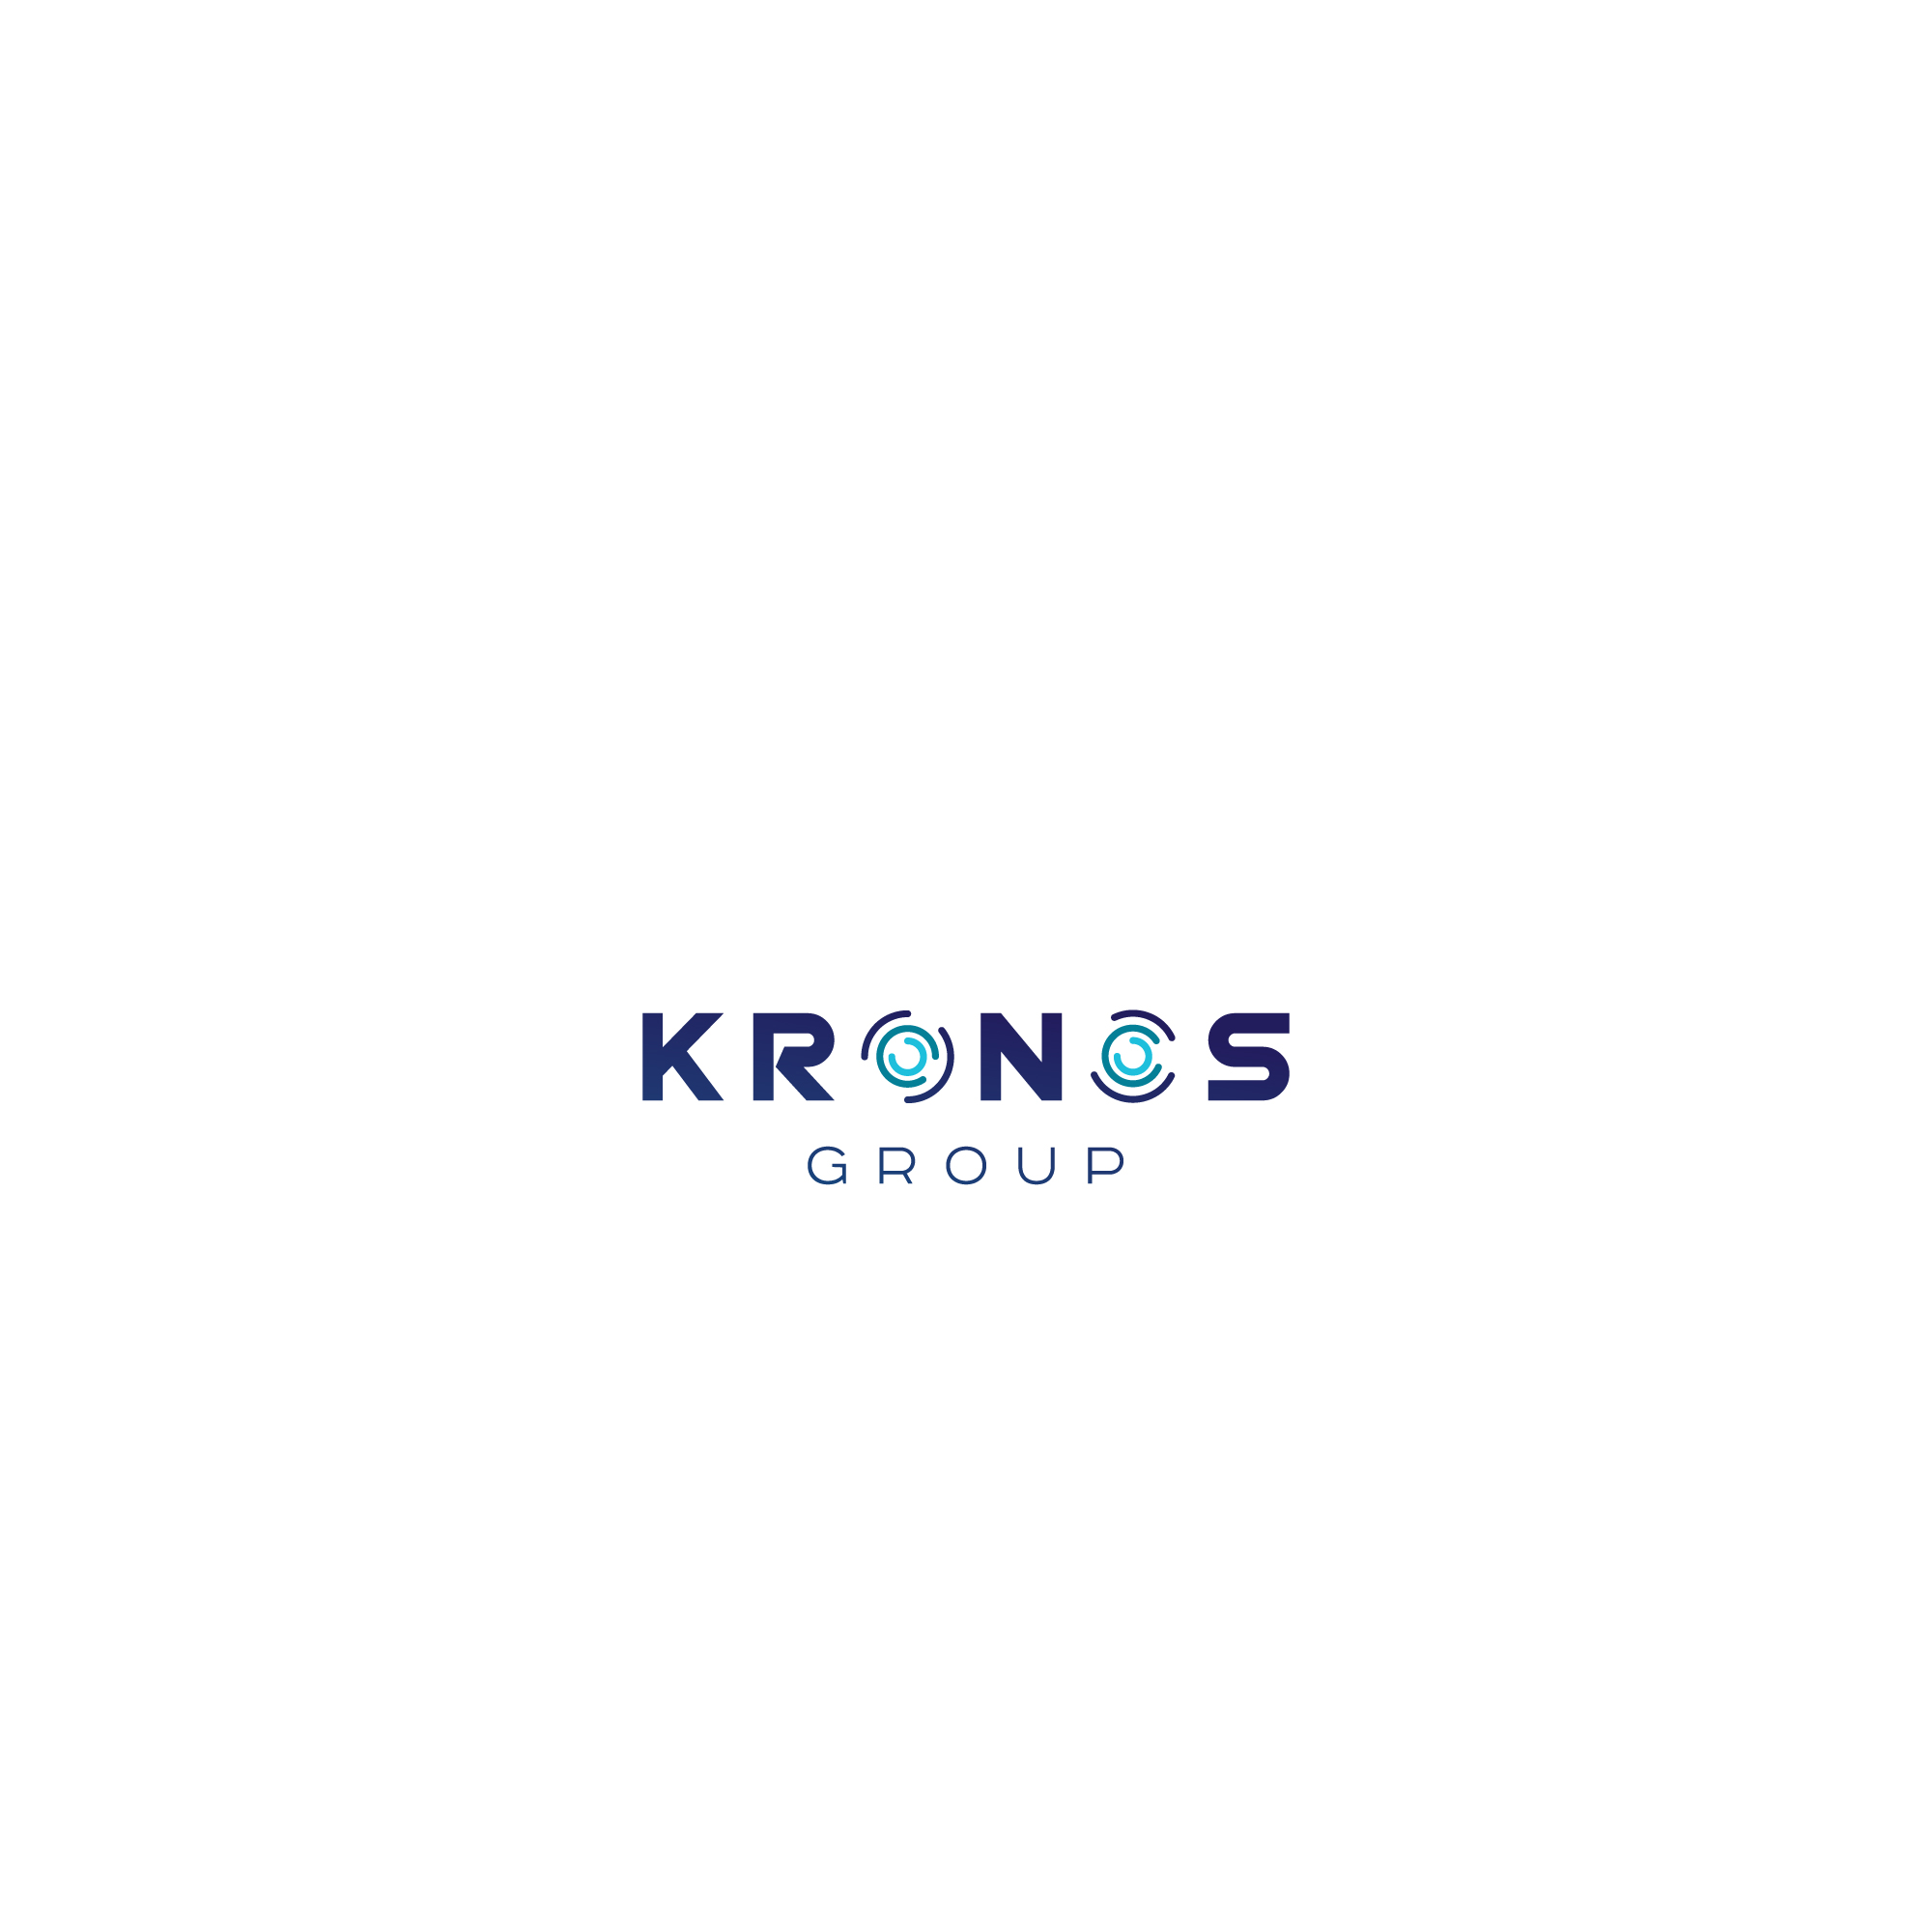 Разработать логотип KRONOS фото f_4205faf1741beb7c.jpg